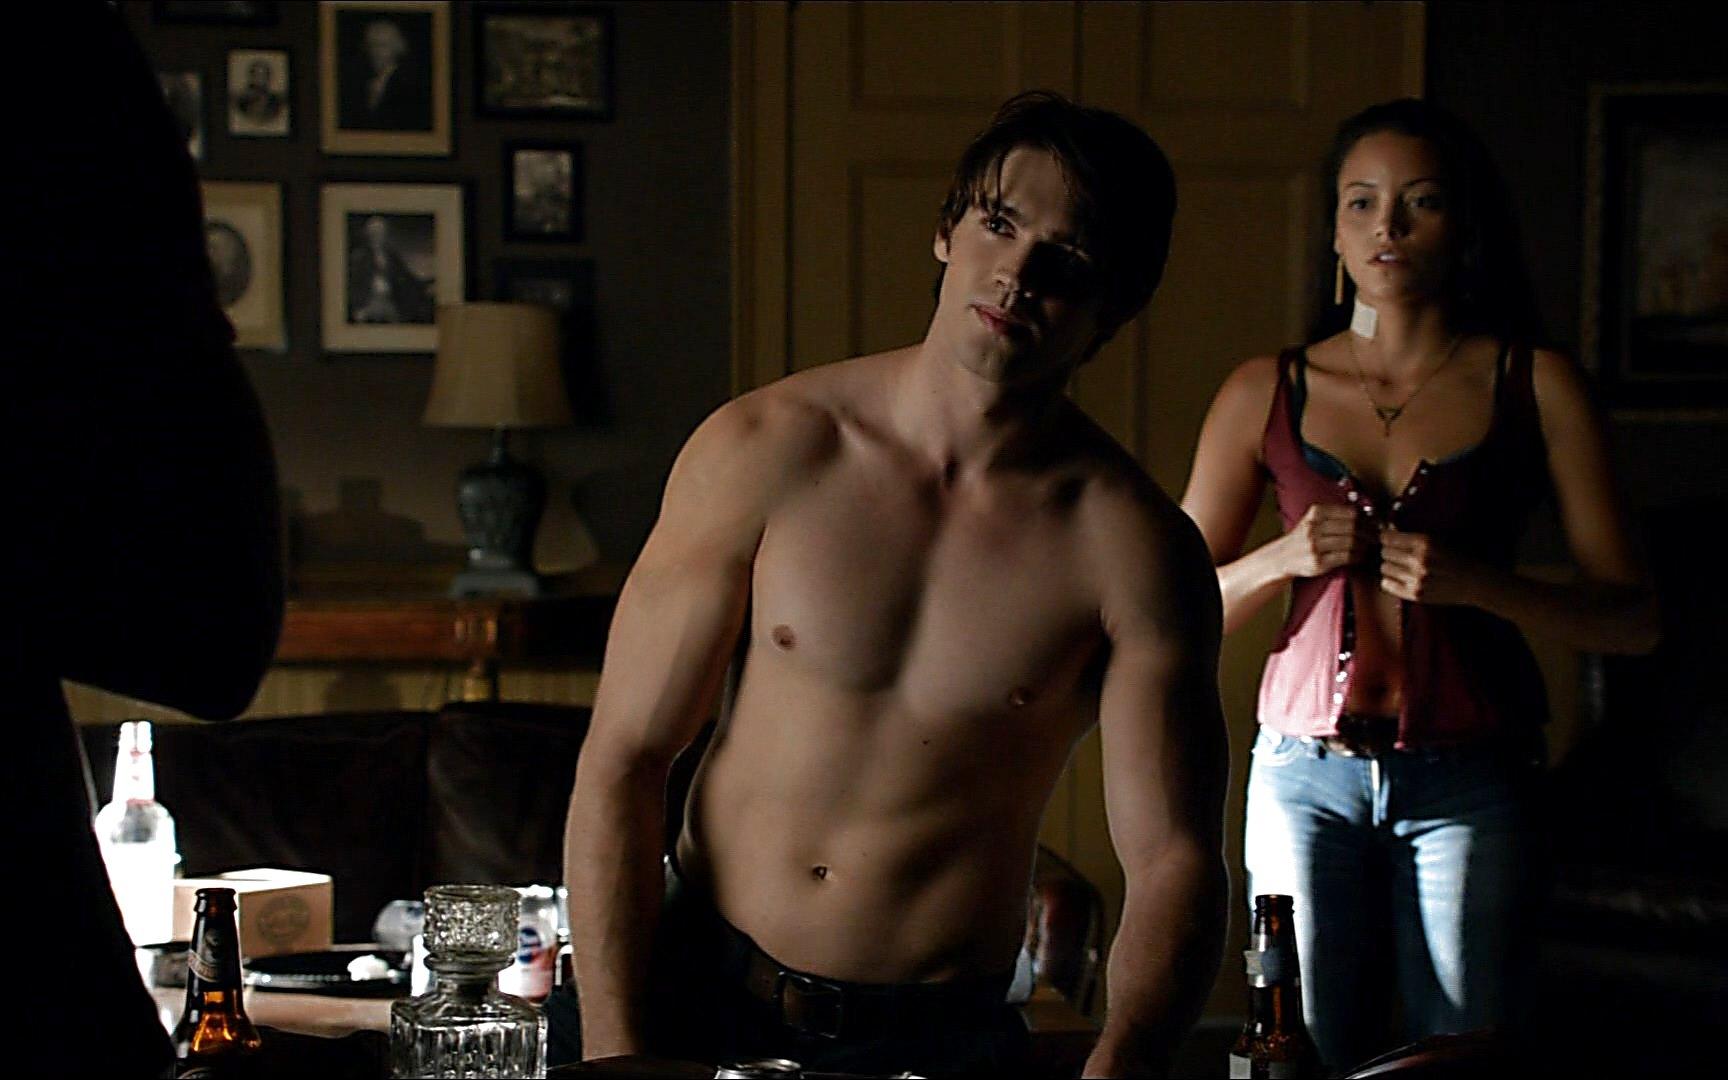 Steven R Mcqueen sexy shirtless scene November 2, 2014, 9pm